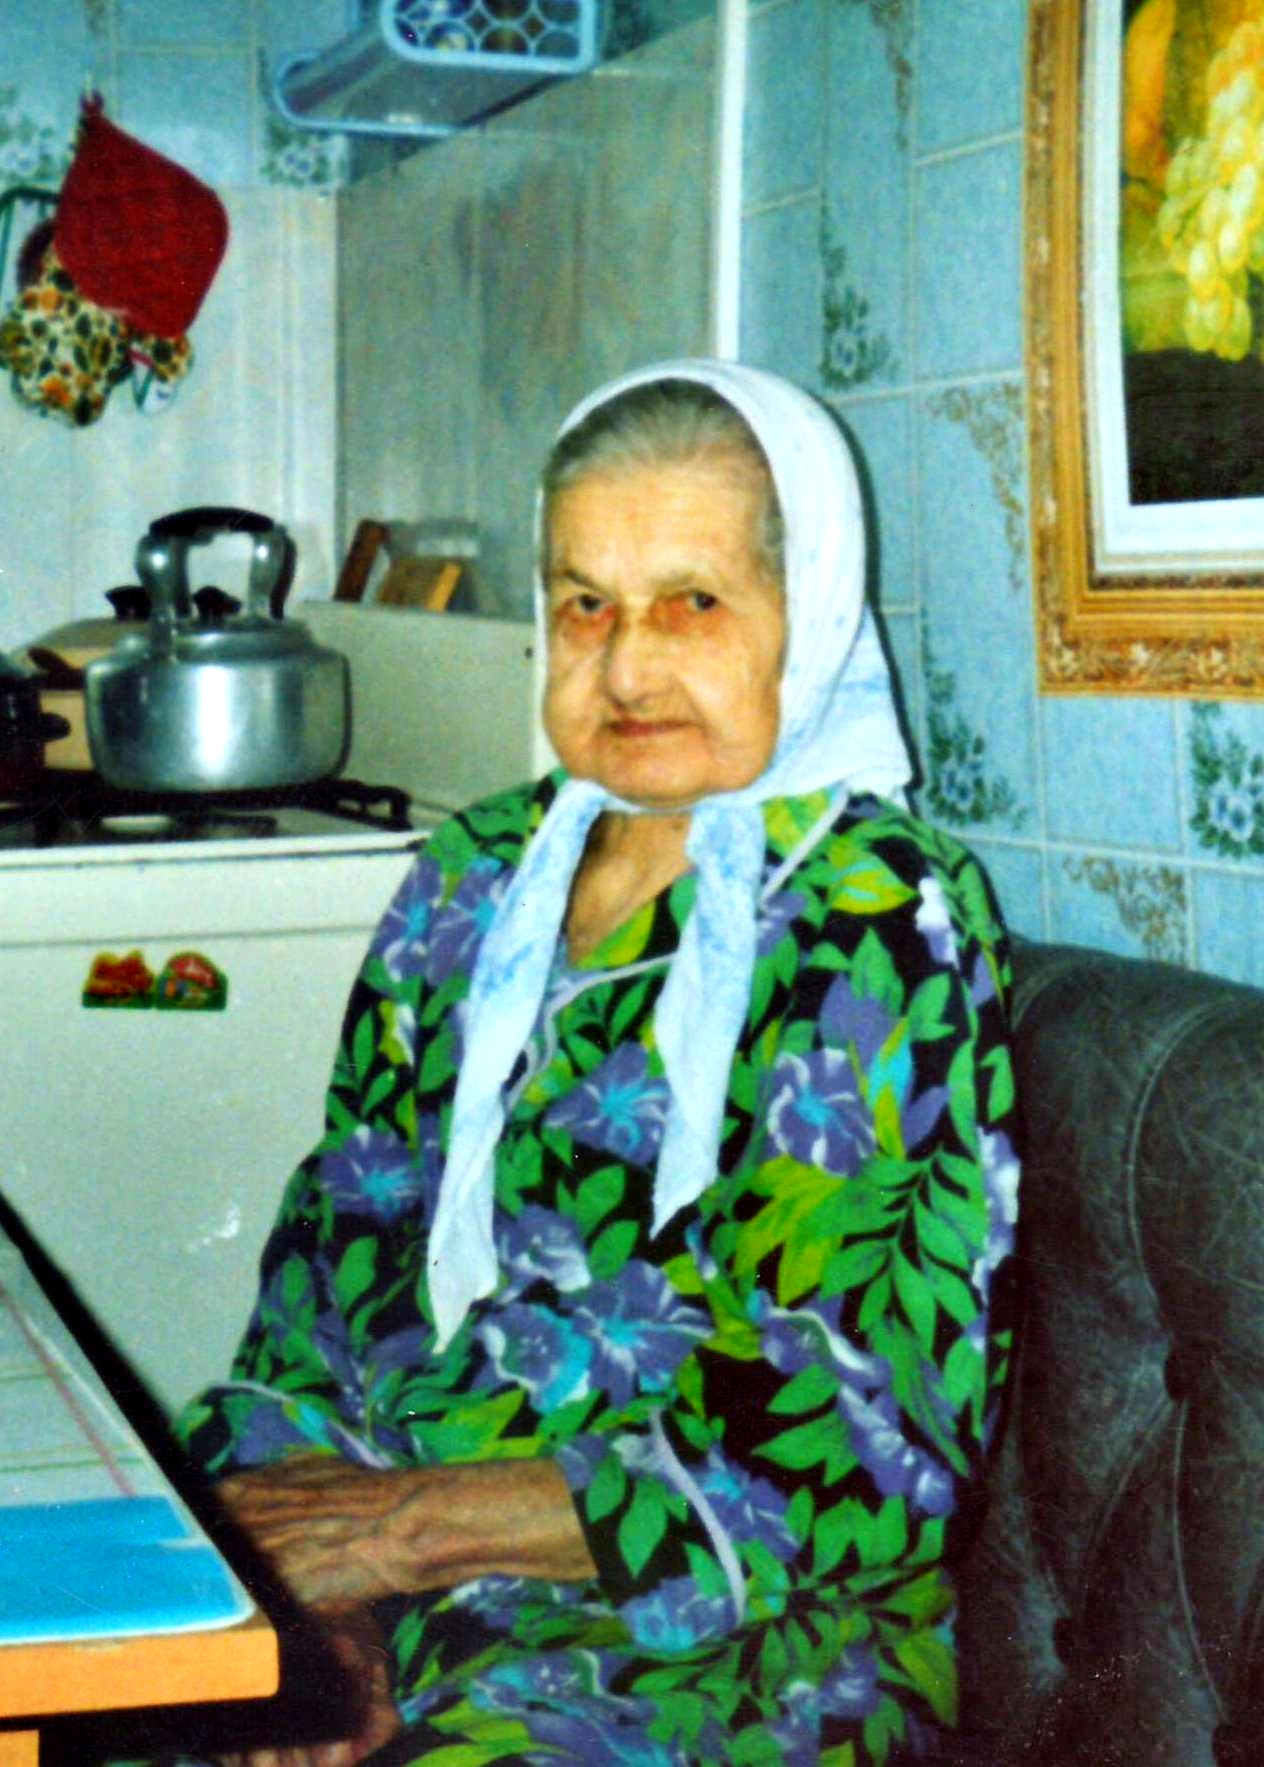 Добрецов Екатерина Павловна. фото из семейного архива внука Добрецова А.Ю.